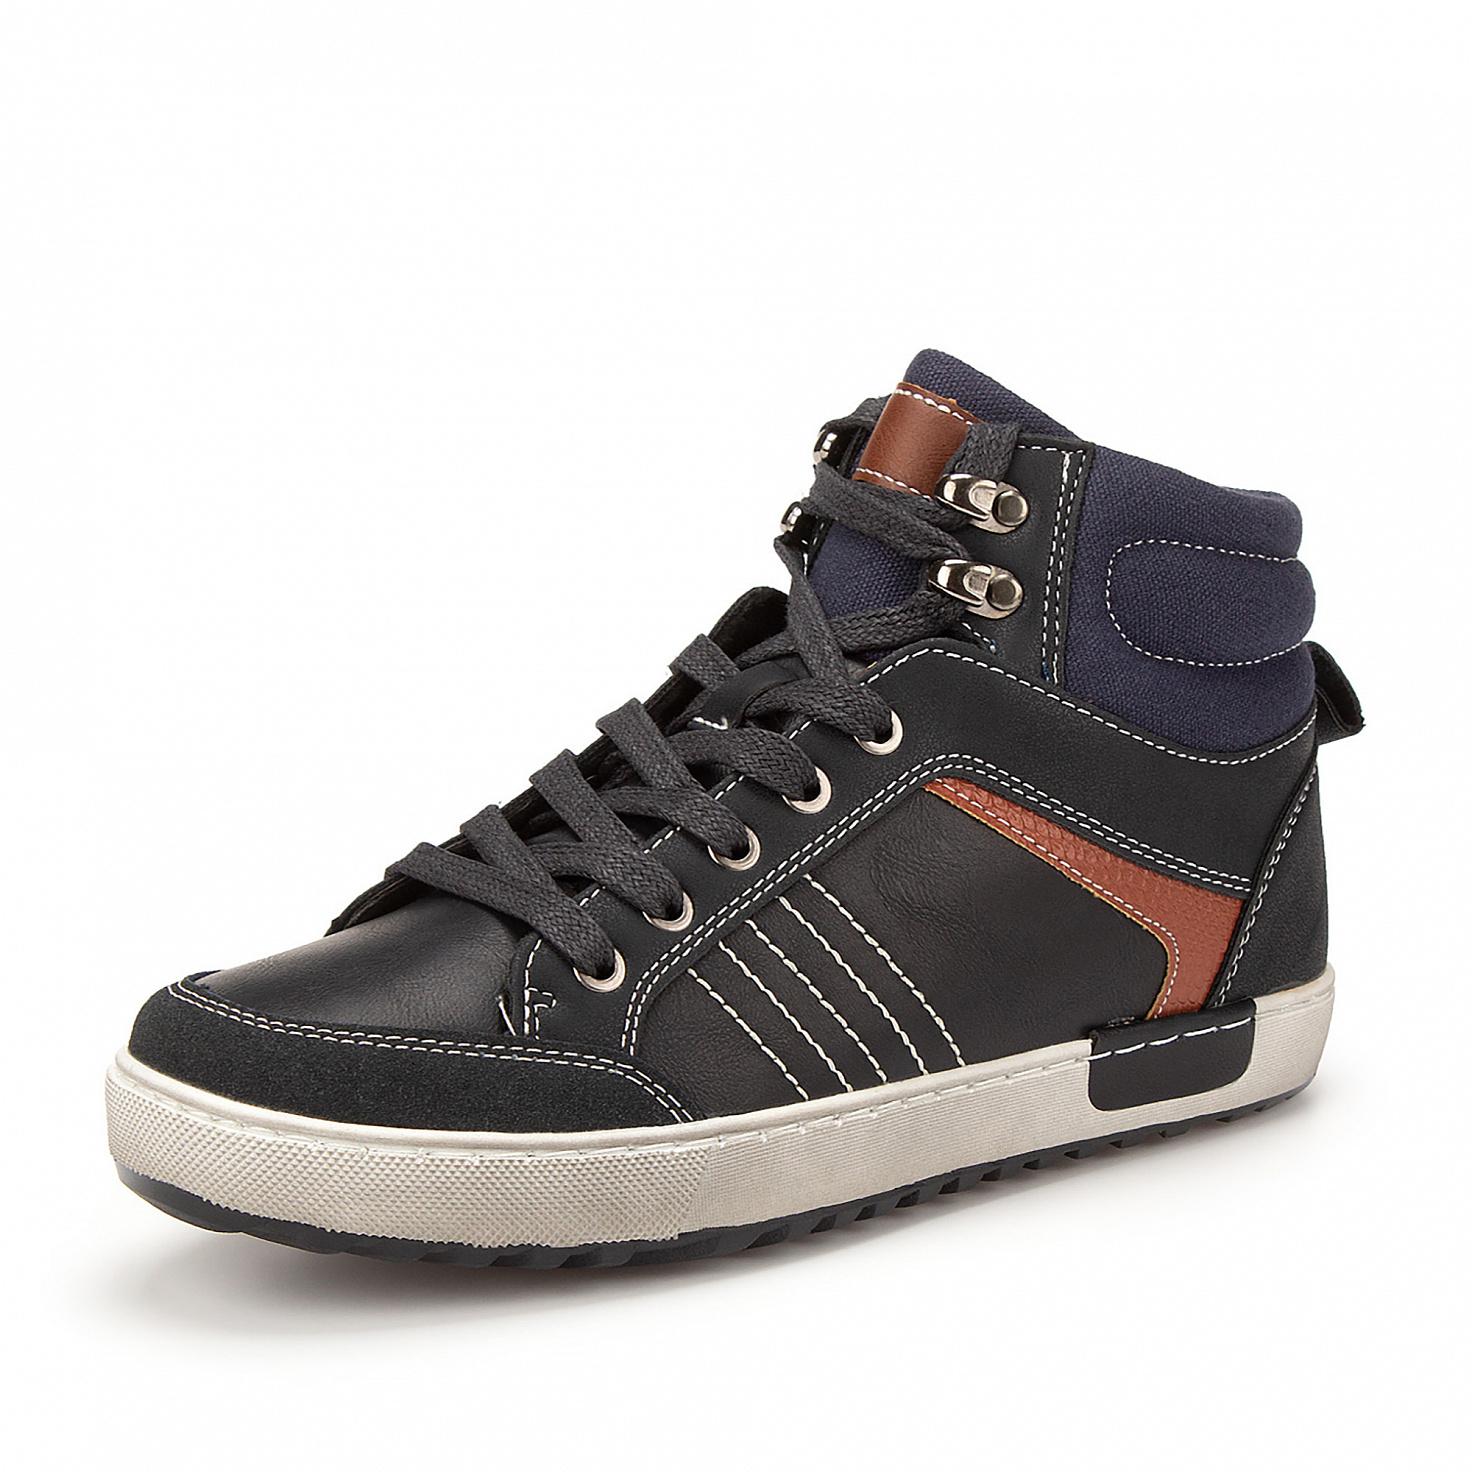 Купить 189-02BO-032SR, Ботинки для мальчиков ZENDEN, цв. синий, р-р 40,